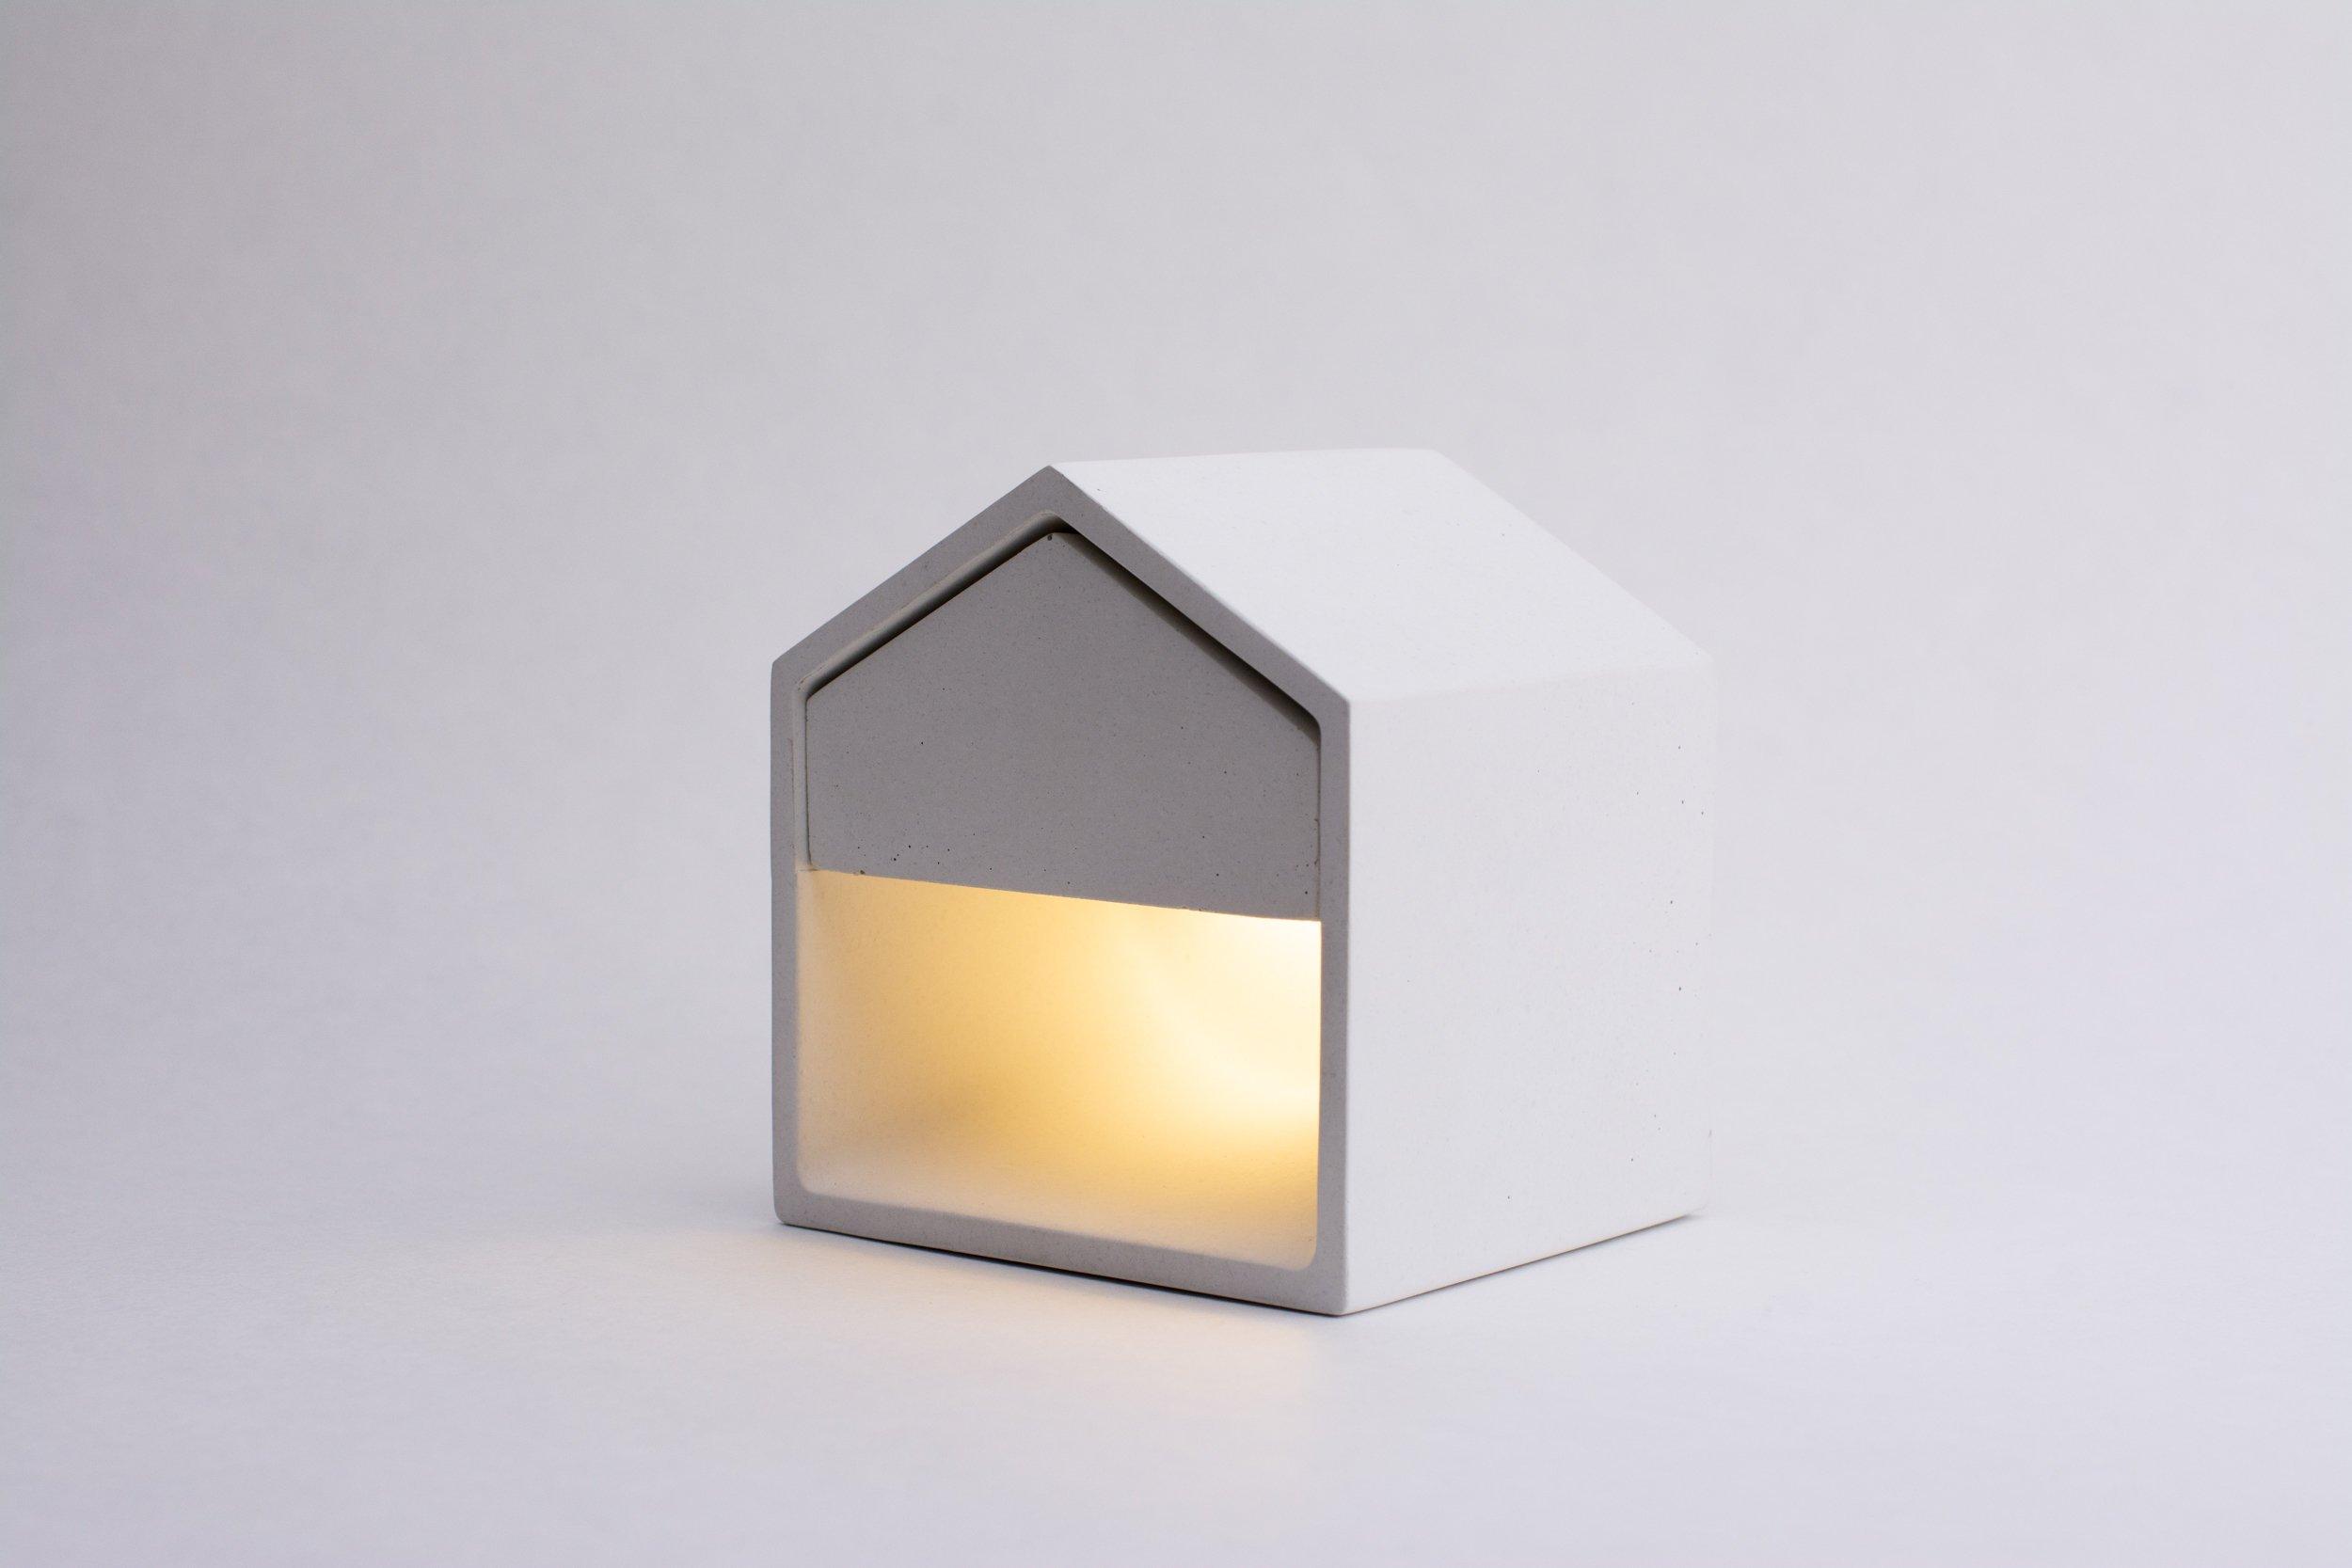 Mit Beton basteln - Betonlampe selber machen